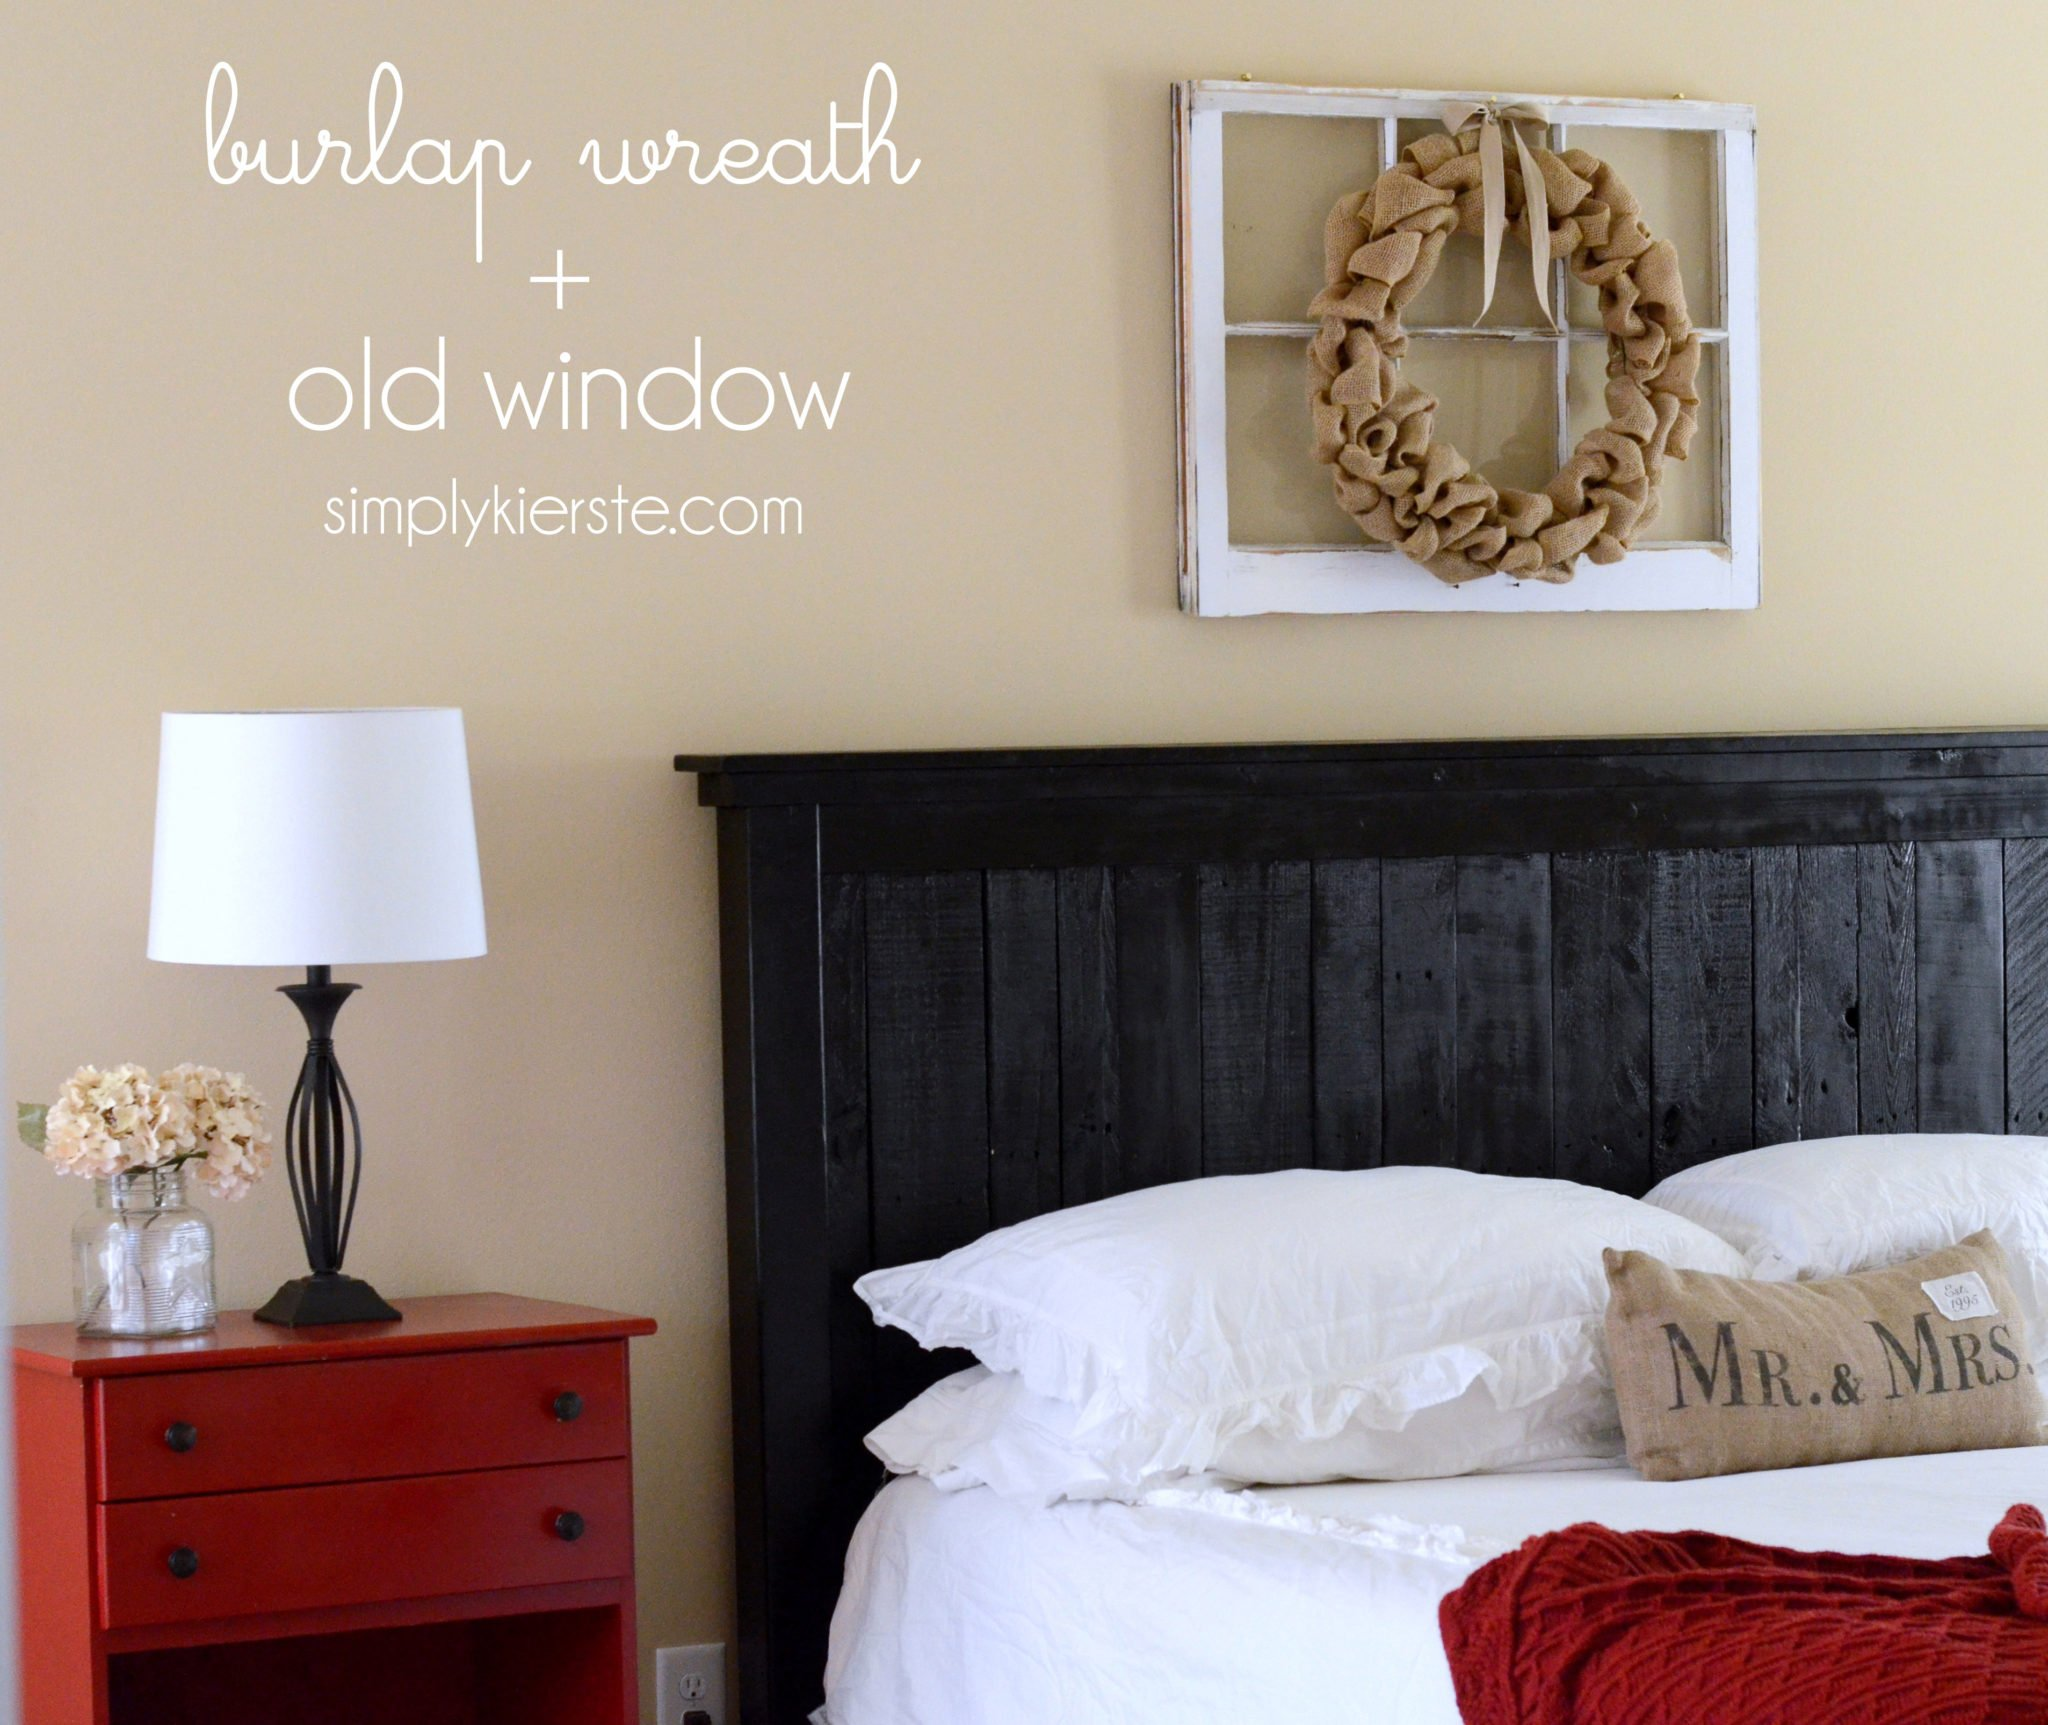 burlap wreath + old window | simplykierste.com